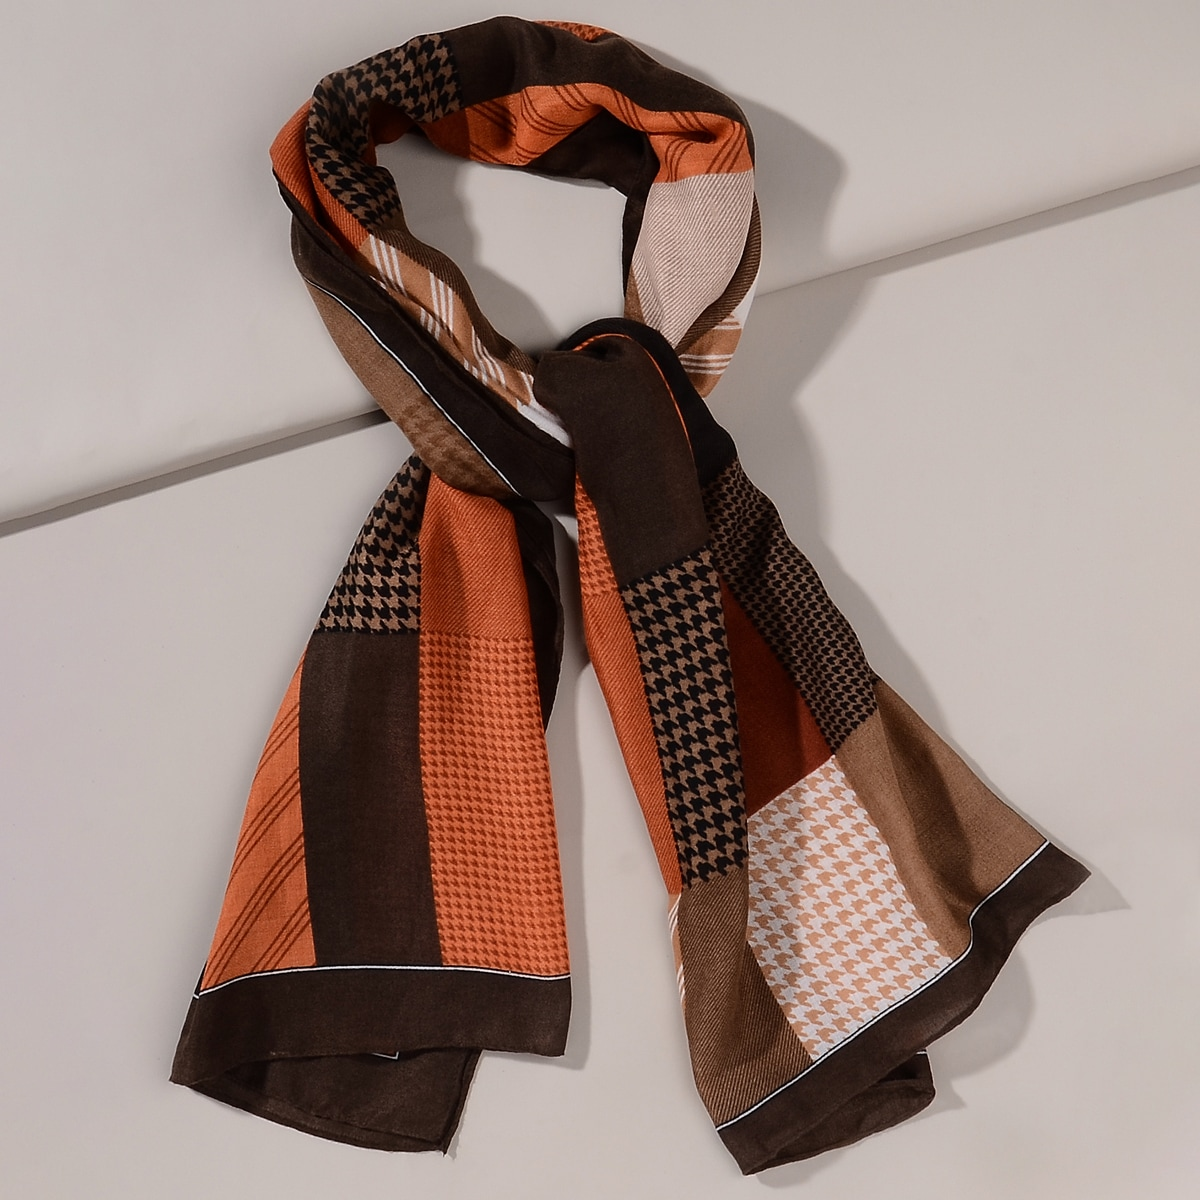 shein Sjaal met kleurblokken in pied-de-poule